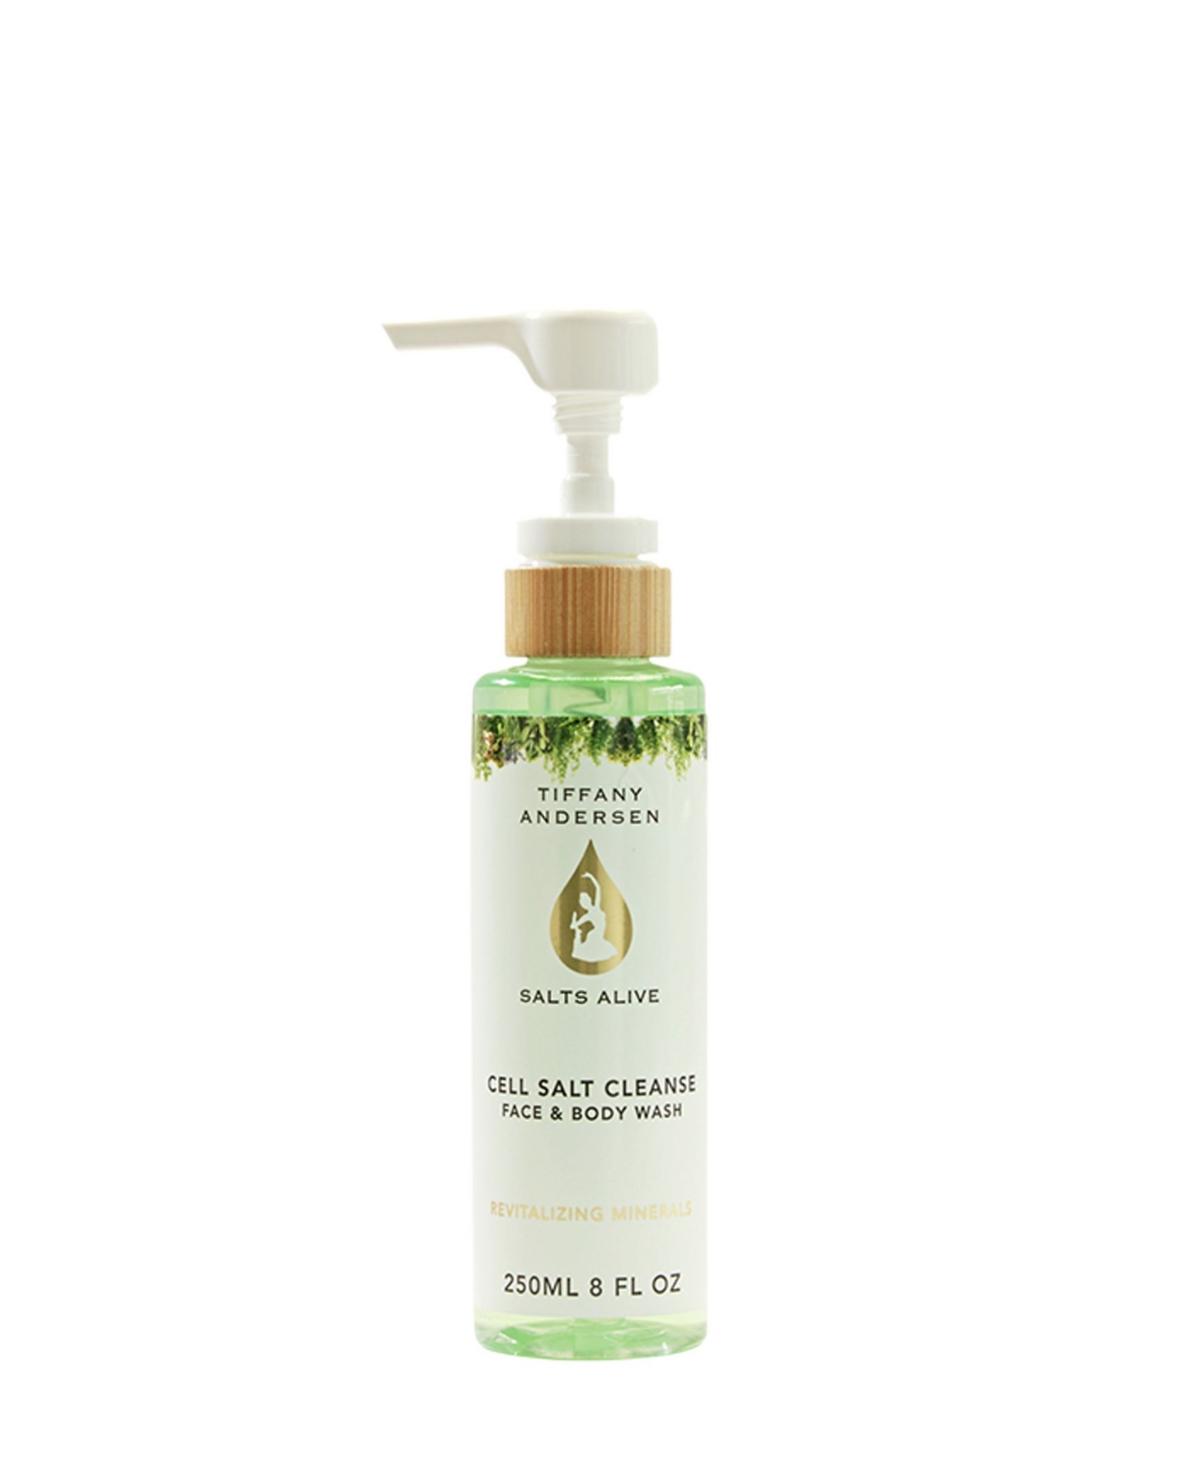 Cell Salt Cleanse Body Wash feat. Hemp Seed Oil